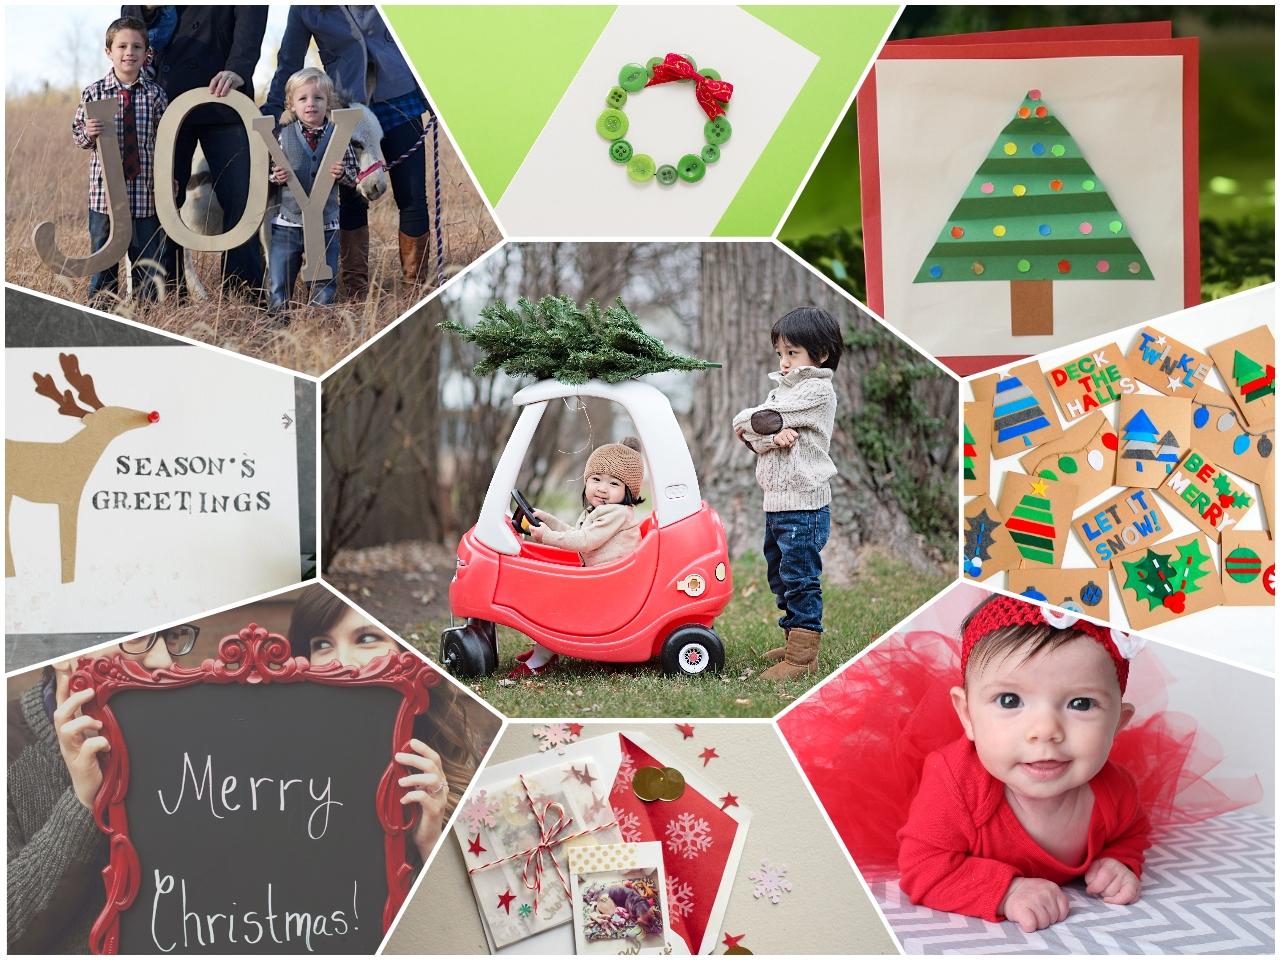 10 Fashionable Creative Christmas Card Photo Ideas fun and creative holiday cards and family photo ideas parentmap 1 2021